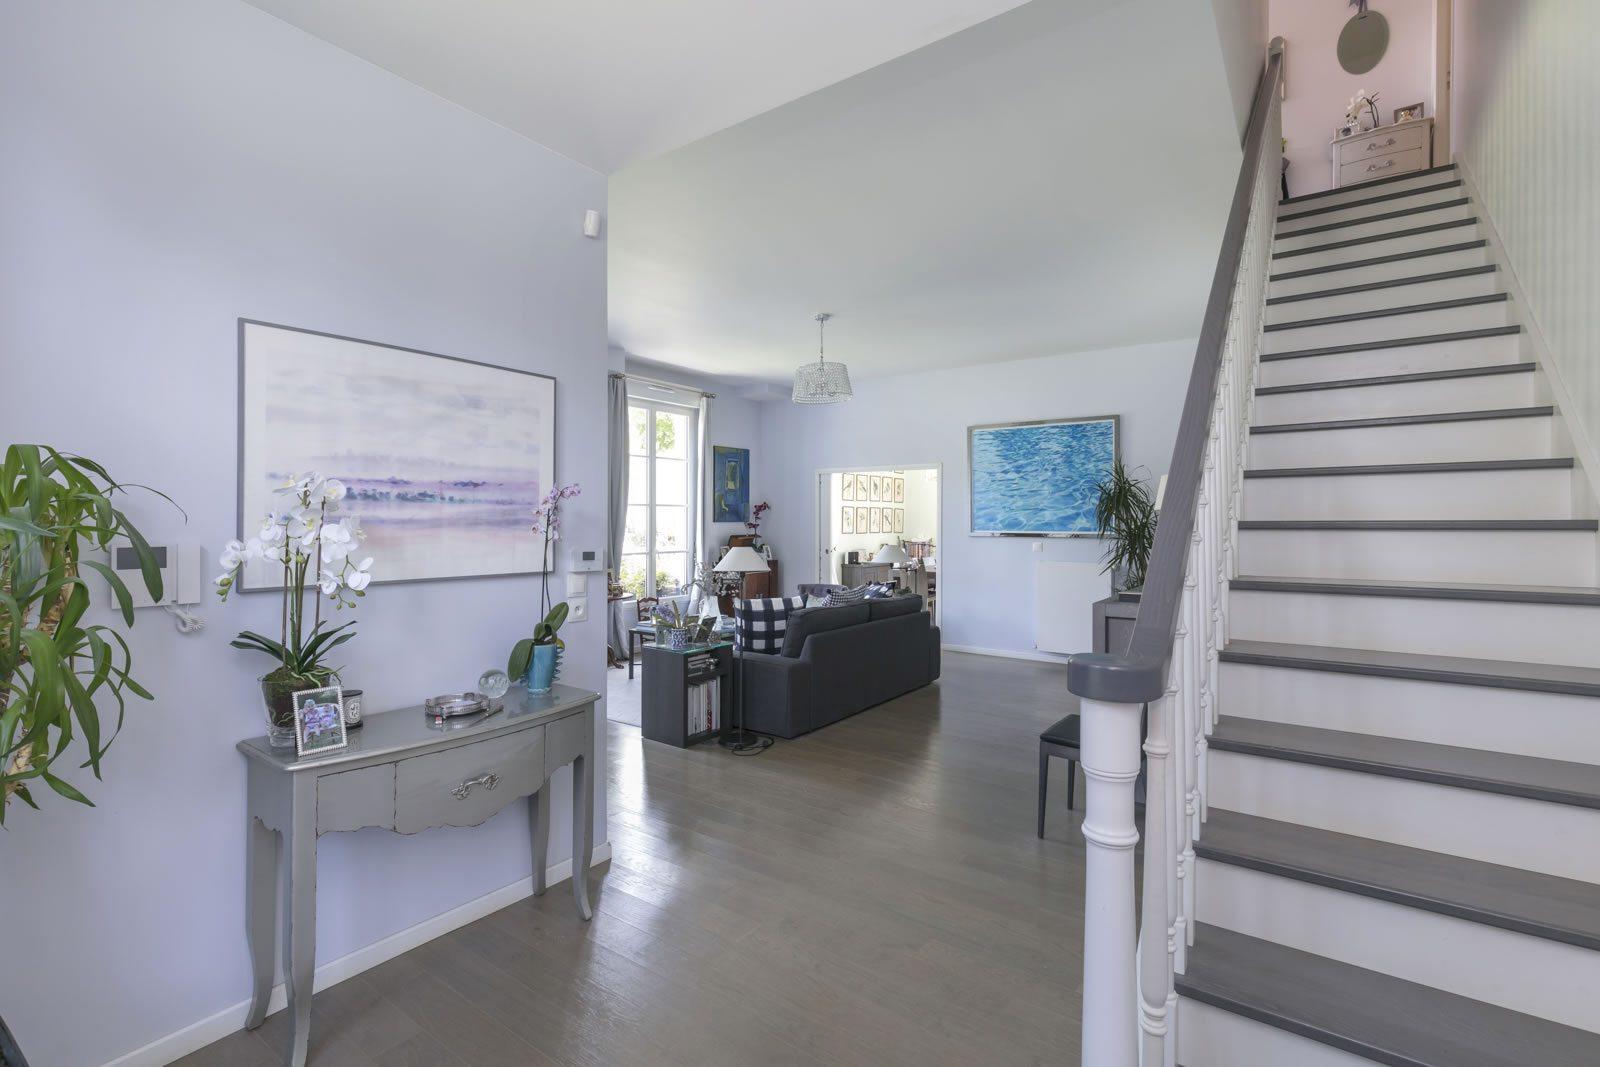 maison de l europe rueil malmaison cool bagelstein with. Black Bedroom Furniture Sets. Home Design Ideas